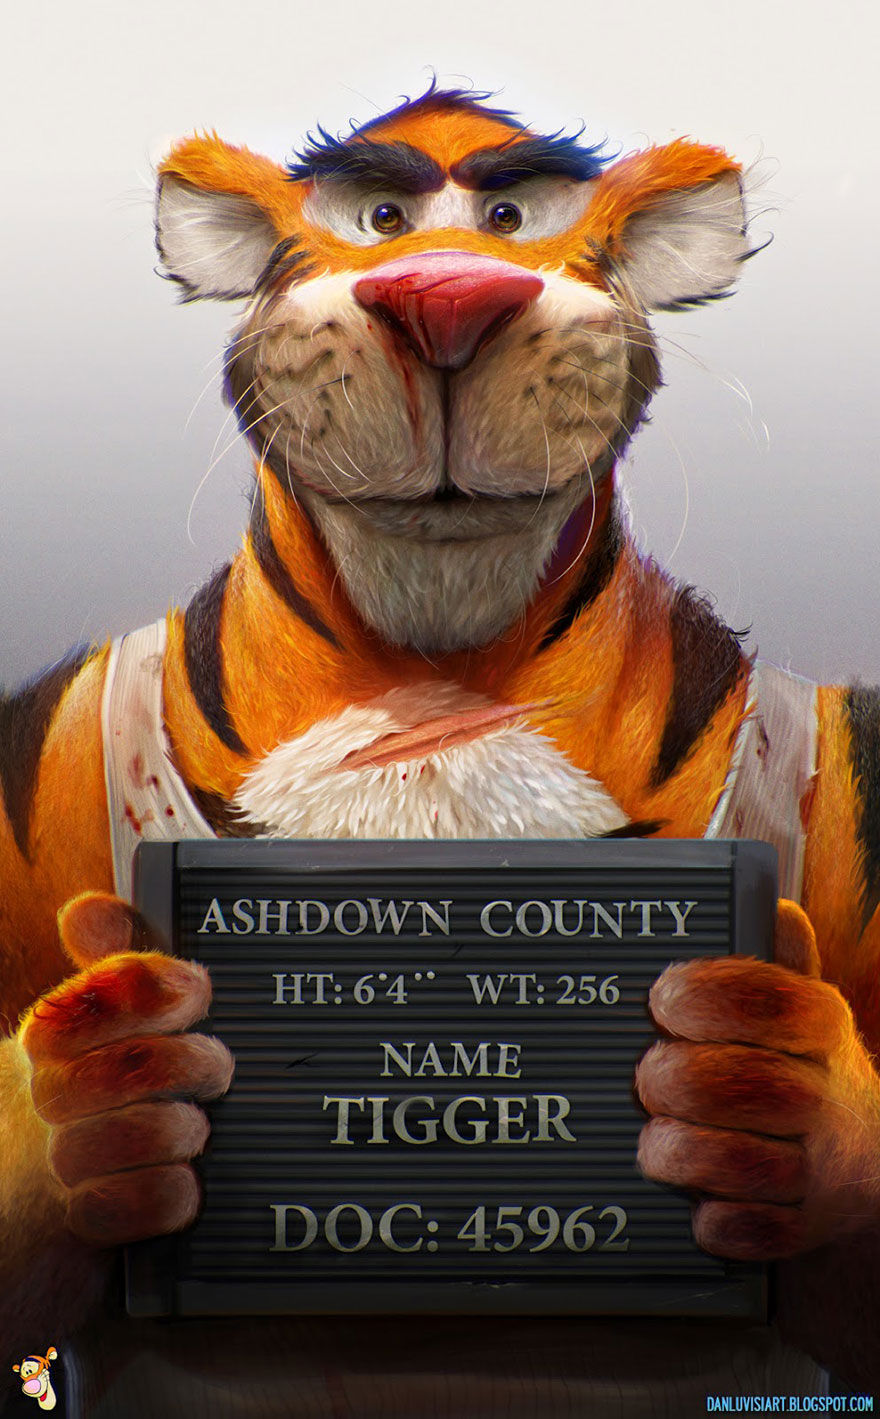 Dan LuVisi Tigger prison mugshot